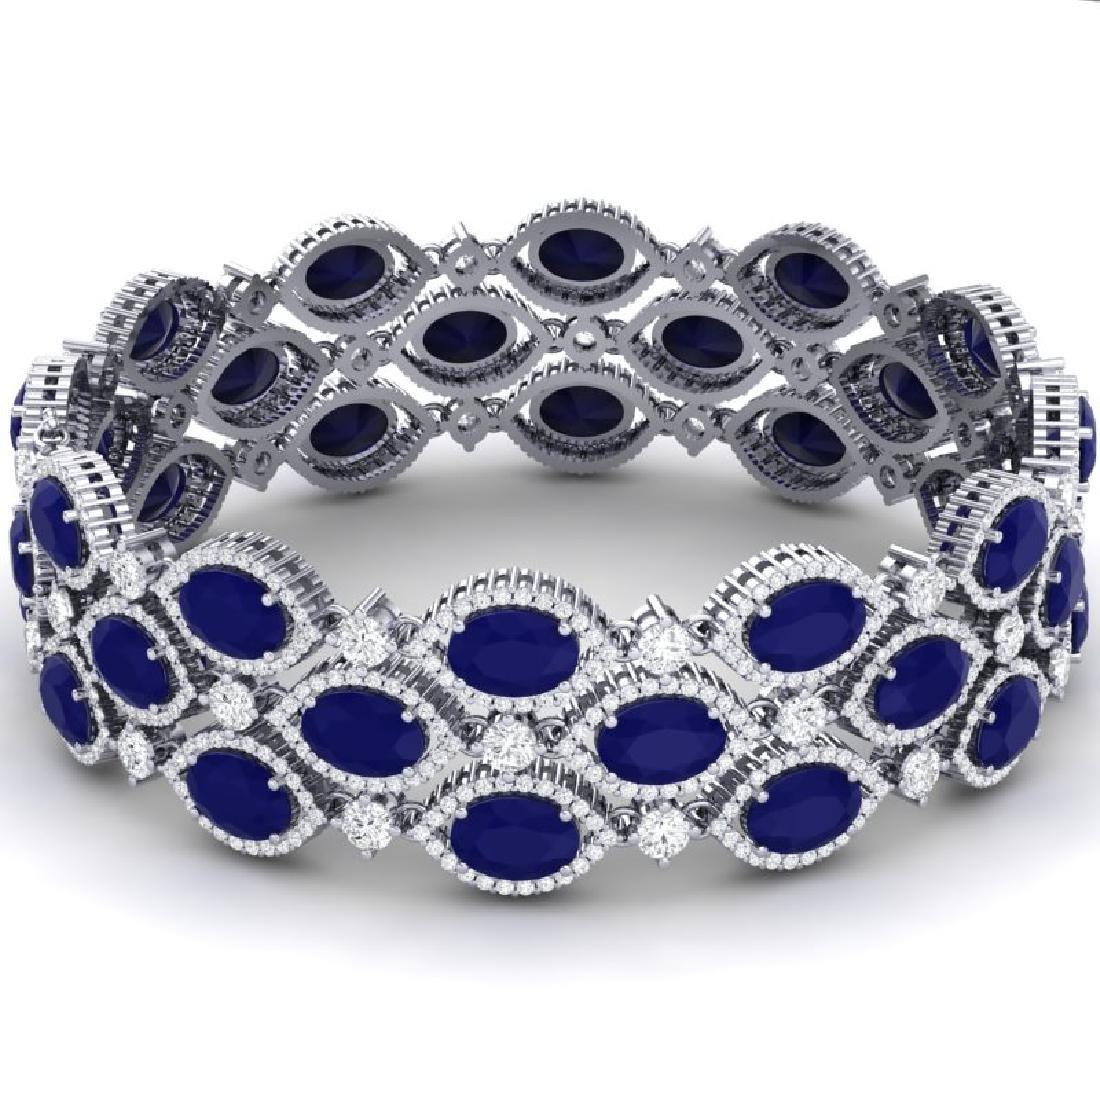 47.84 CTW Royalty Sapphire & VS Diamond Bracelet 18K - 2